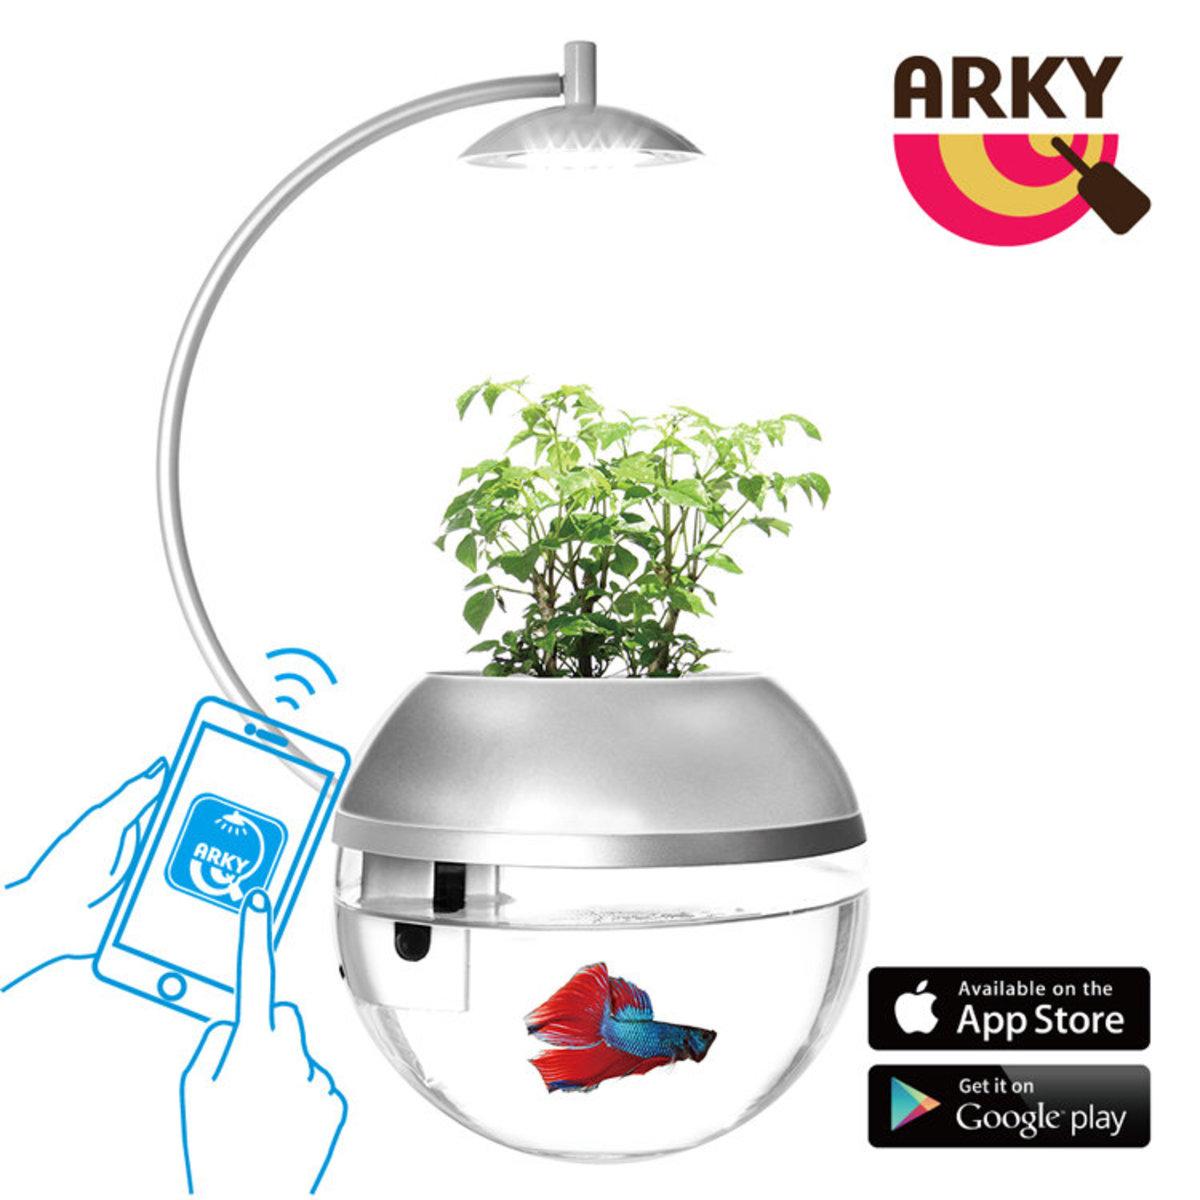 ARKY 香草與魚X智能版Herb&Fish® X Connect - 京都銀限量版